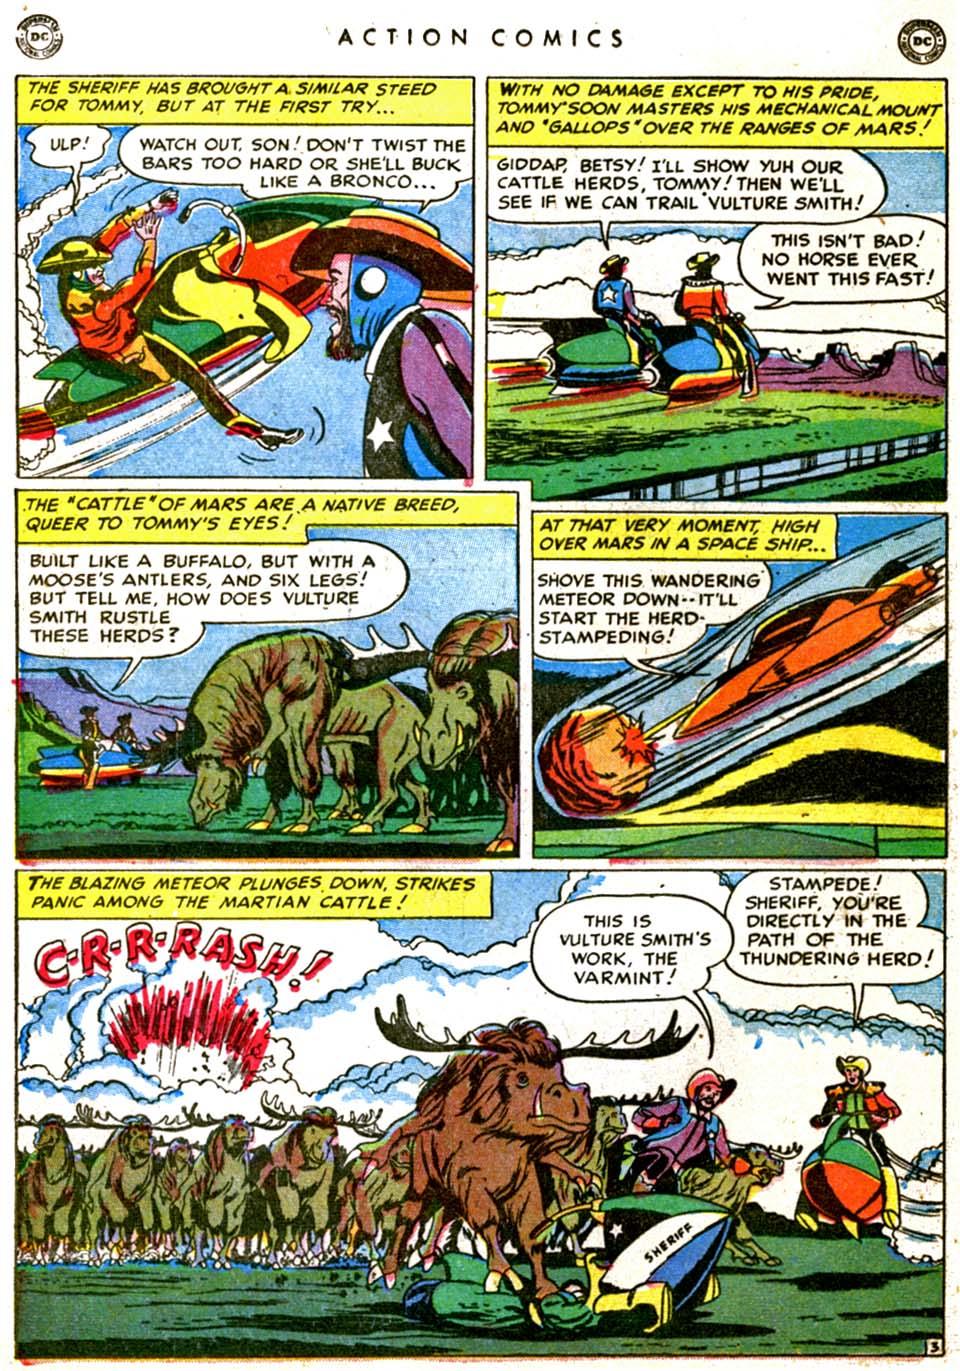 Action Comics (1938) 139 Page 17